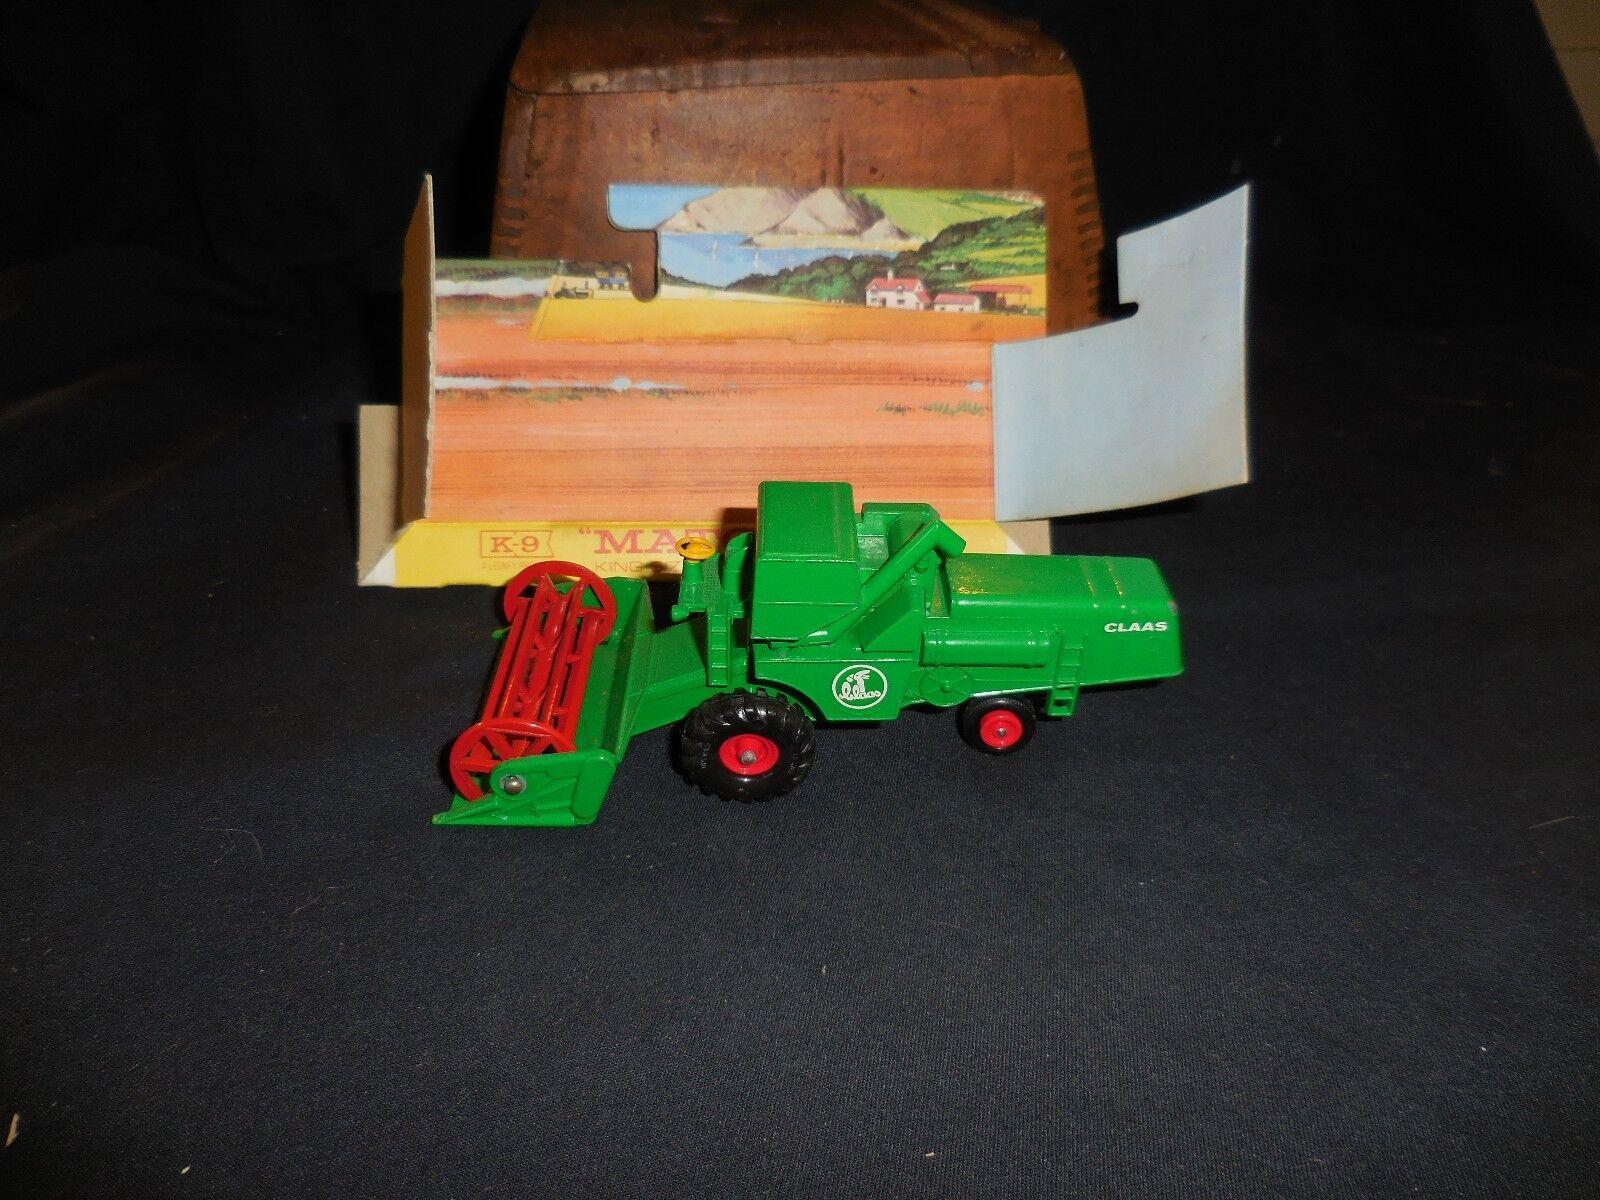 Vintage Matchbox K-9 K-9 K-9 Combine Harvester Insert No Box 140073